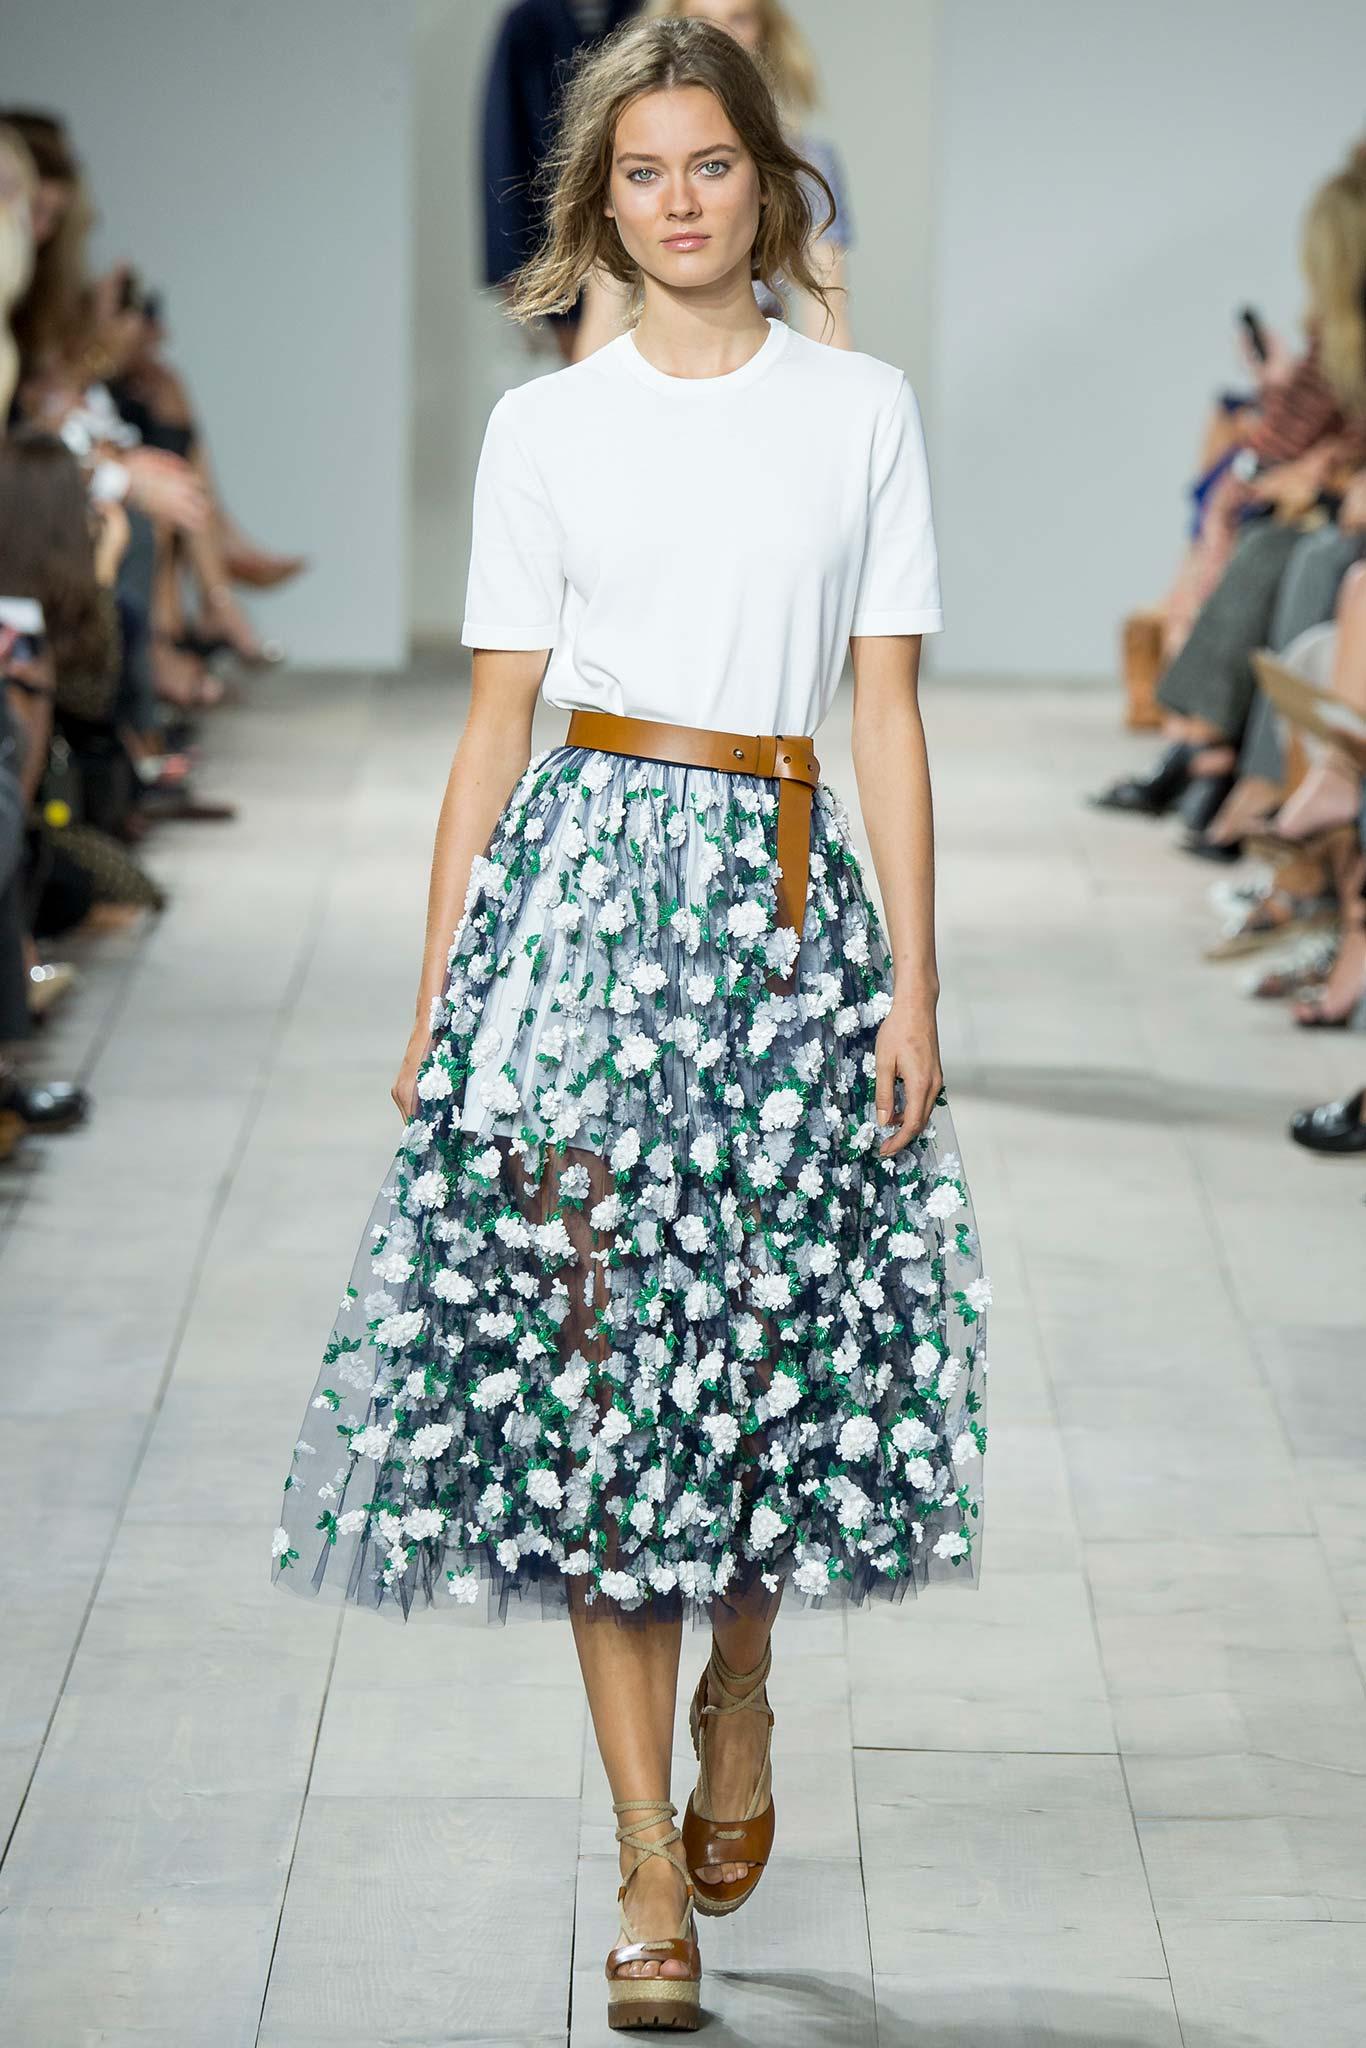 blue-med-midi-skirt-white-tee-belt-print-wear-outfit-spring-summer-cognac-shoe-sandalw-pony-runway-hairr-lunch.jpg